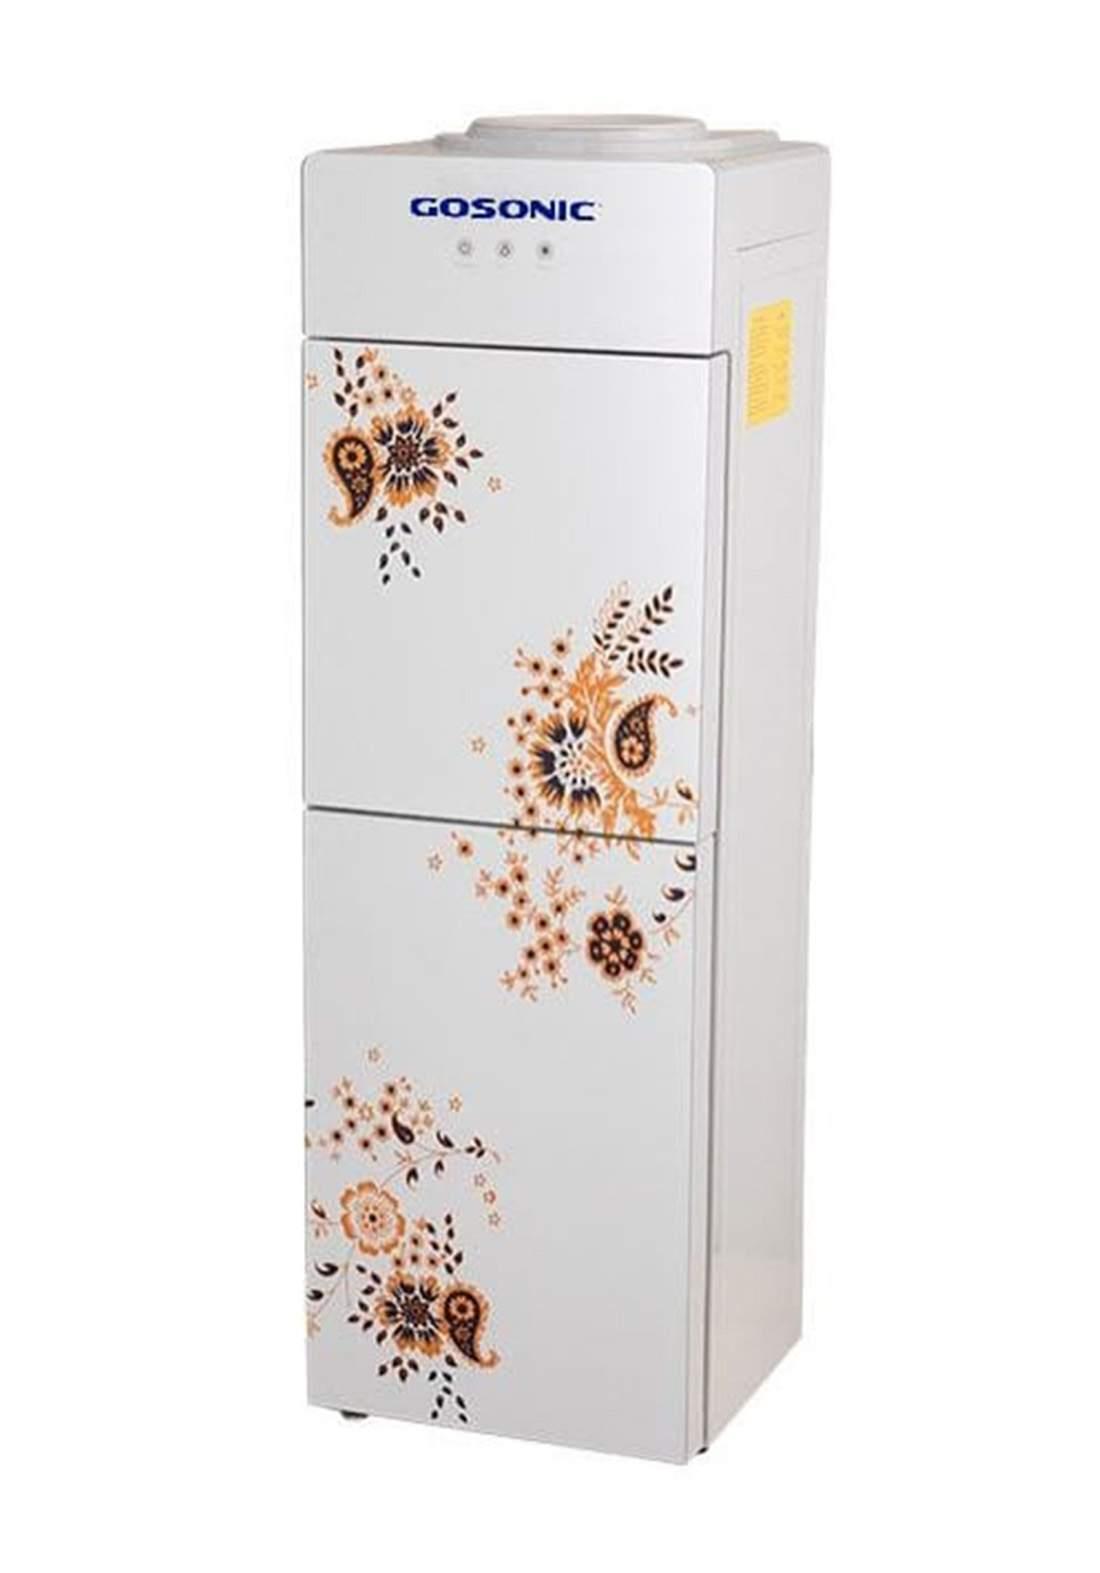 Gosonic GWD-524Water Dispenser  براد مياه